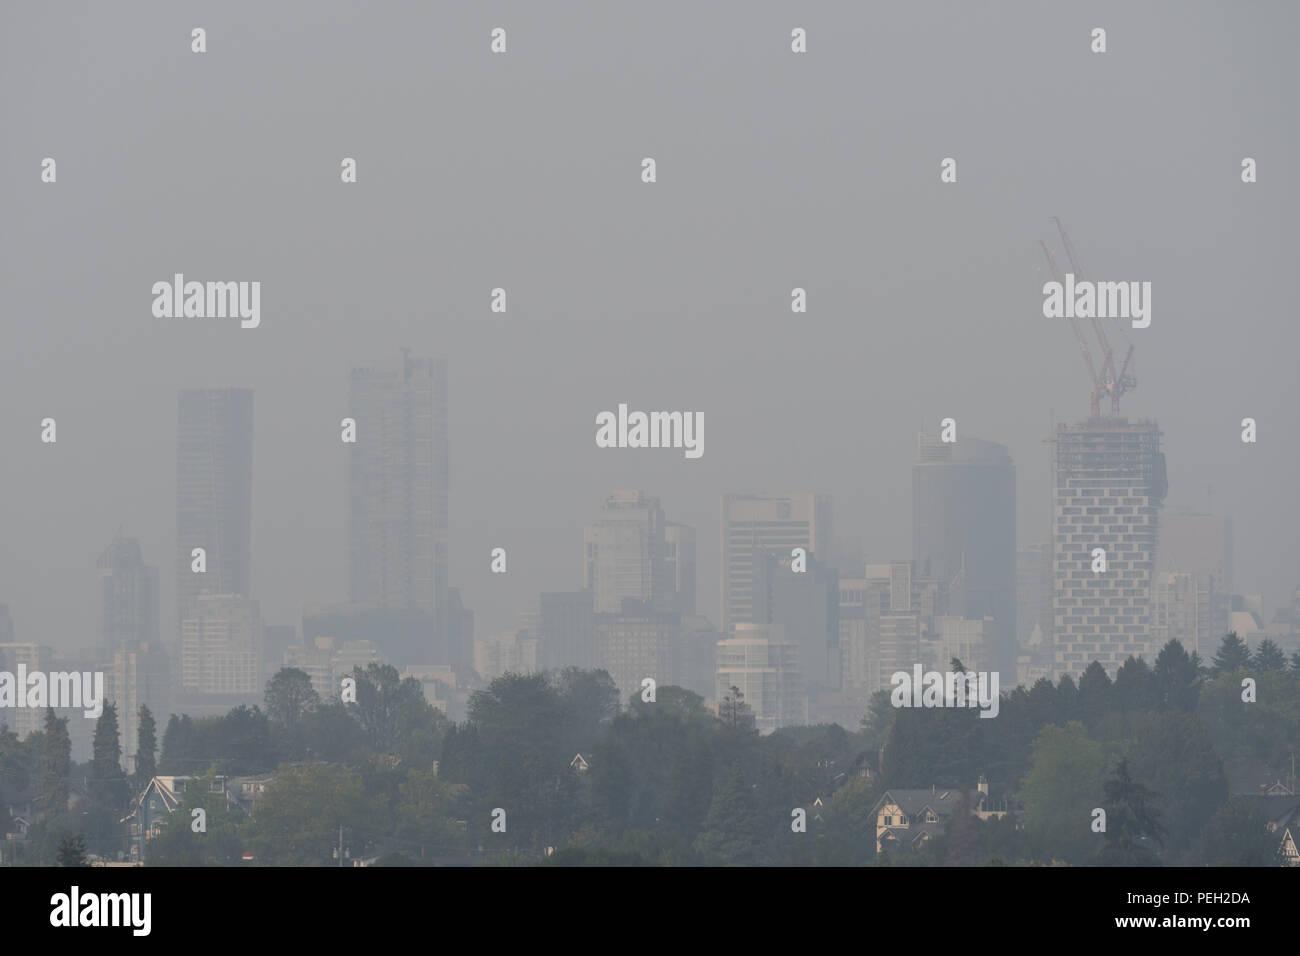 Smoke Vancouver : Weather Service Forecasts Smoky Skies In Washington State Katu